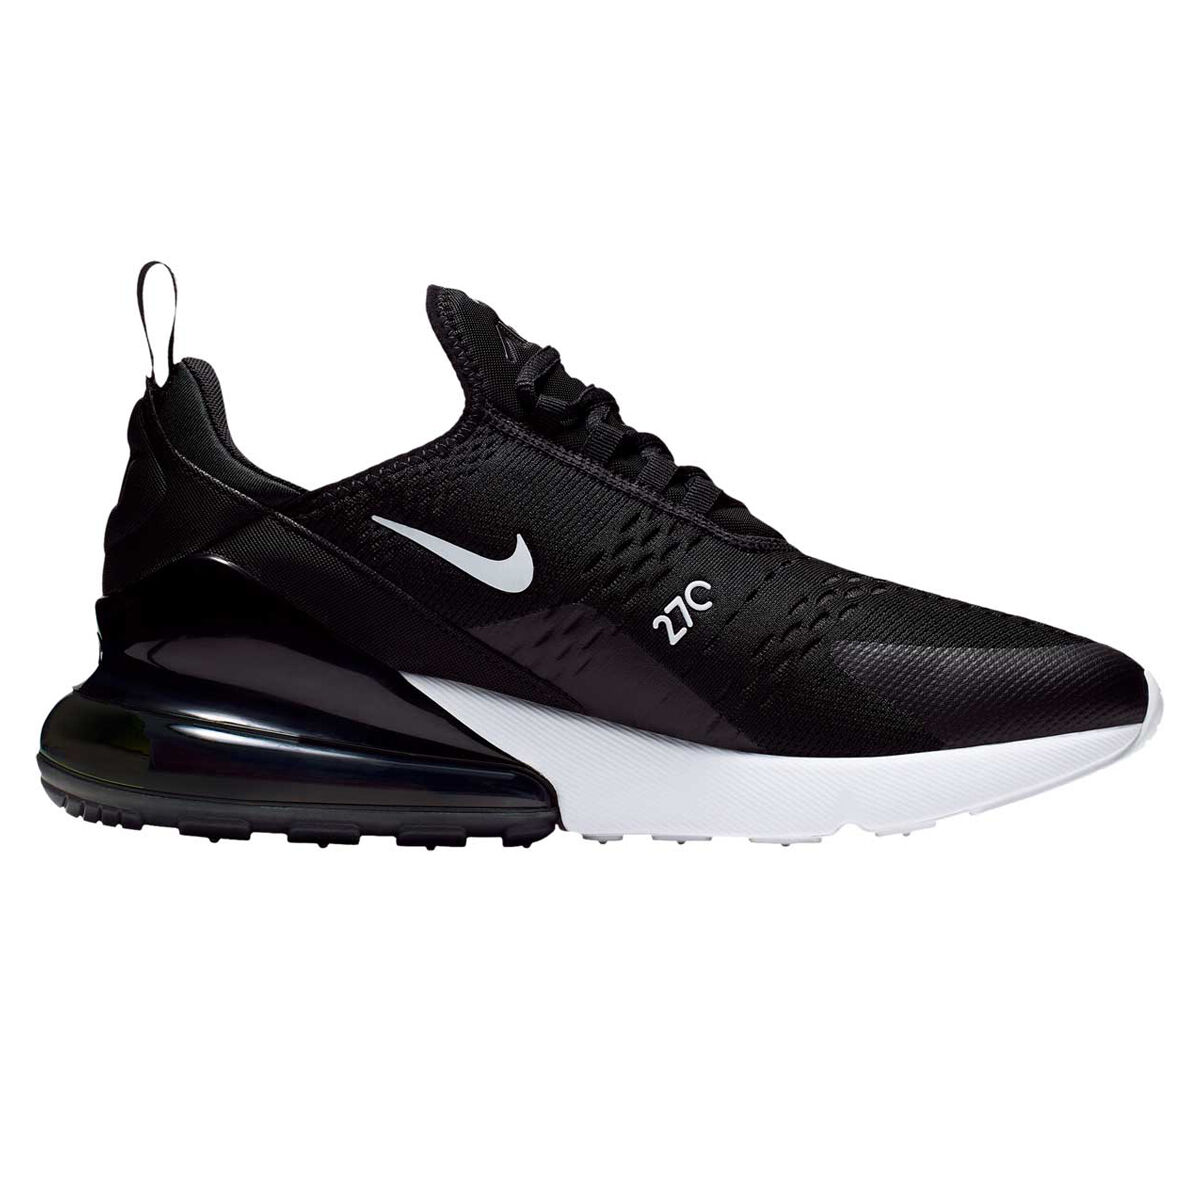 Nike Air Max 270 Mens Casual Shoes Black/White US 9 | Rebel ...